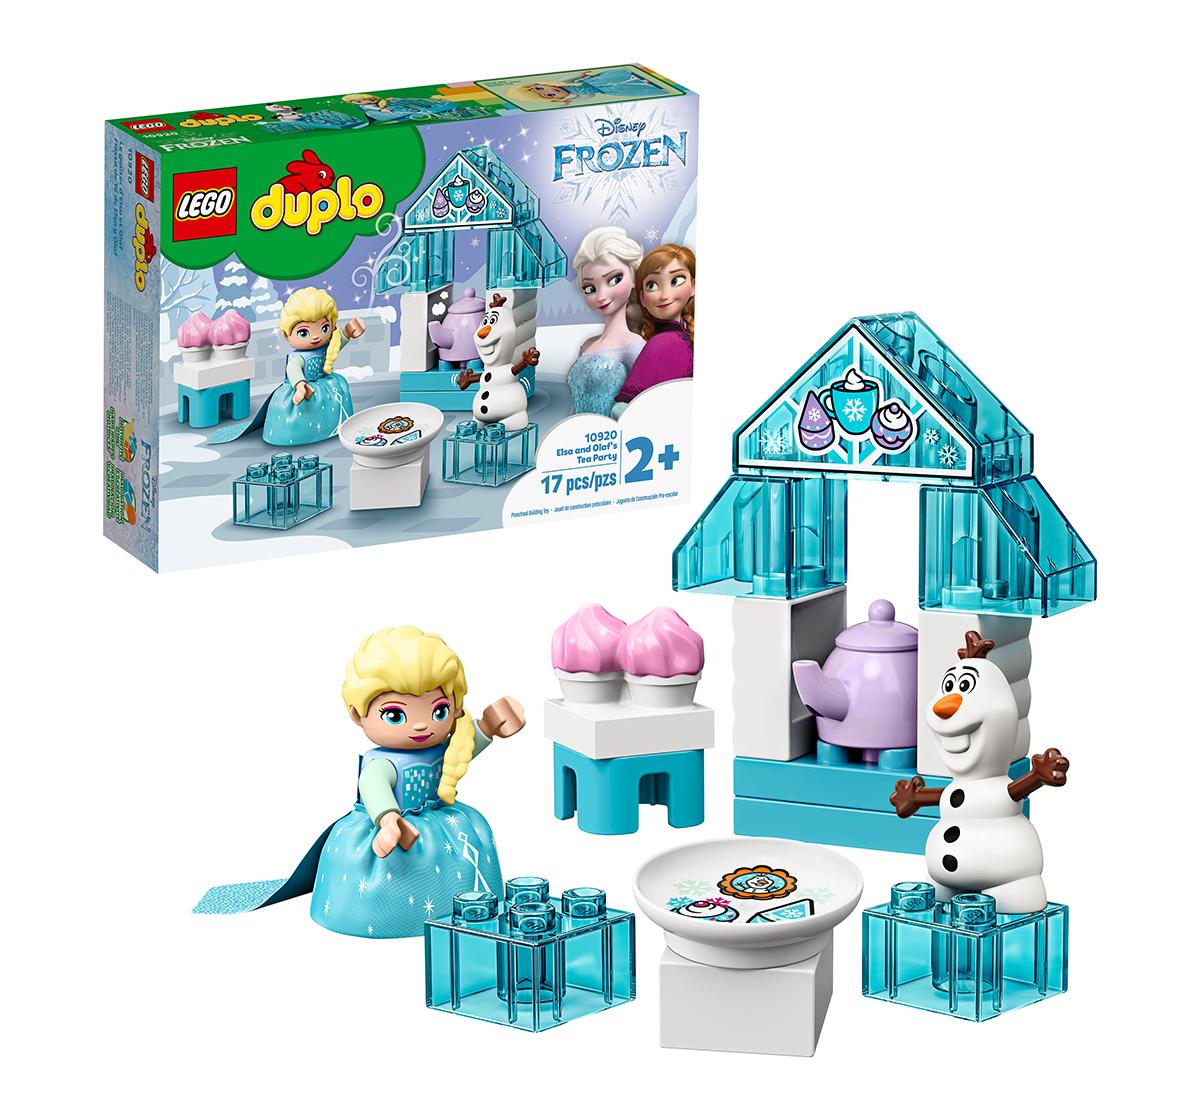 LEGO | LEGO 10920 Elsa and Olaf's Tea Party Lego Blocks for Kids age 2Y+